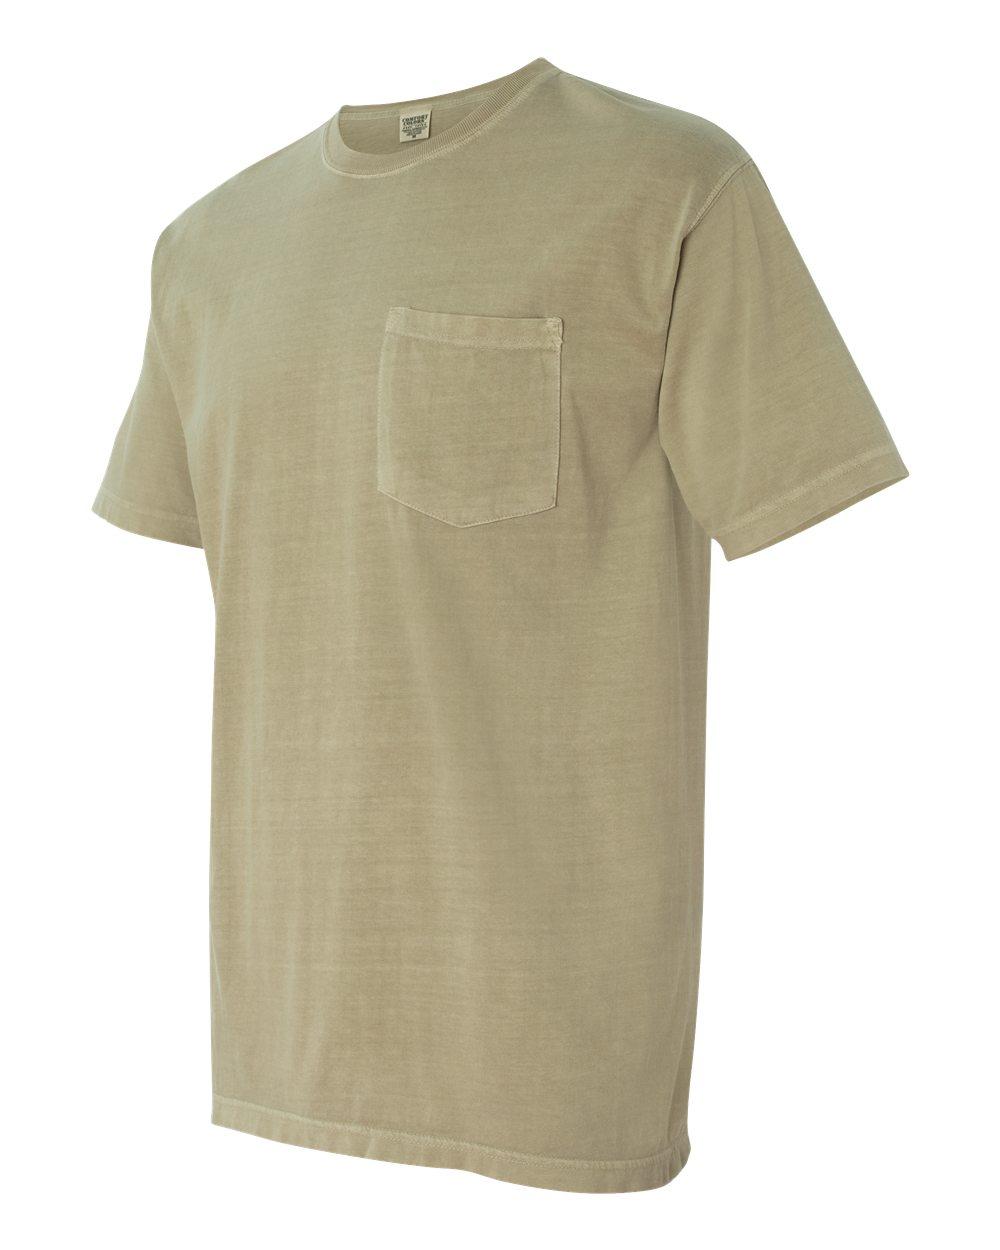 5ae0f1370 6030CC Comfort Colors 6.1 oz. Garment Dyed Pocket T Shirt > T-Shirts